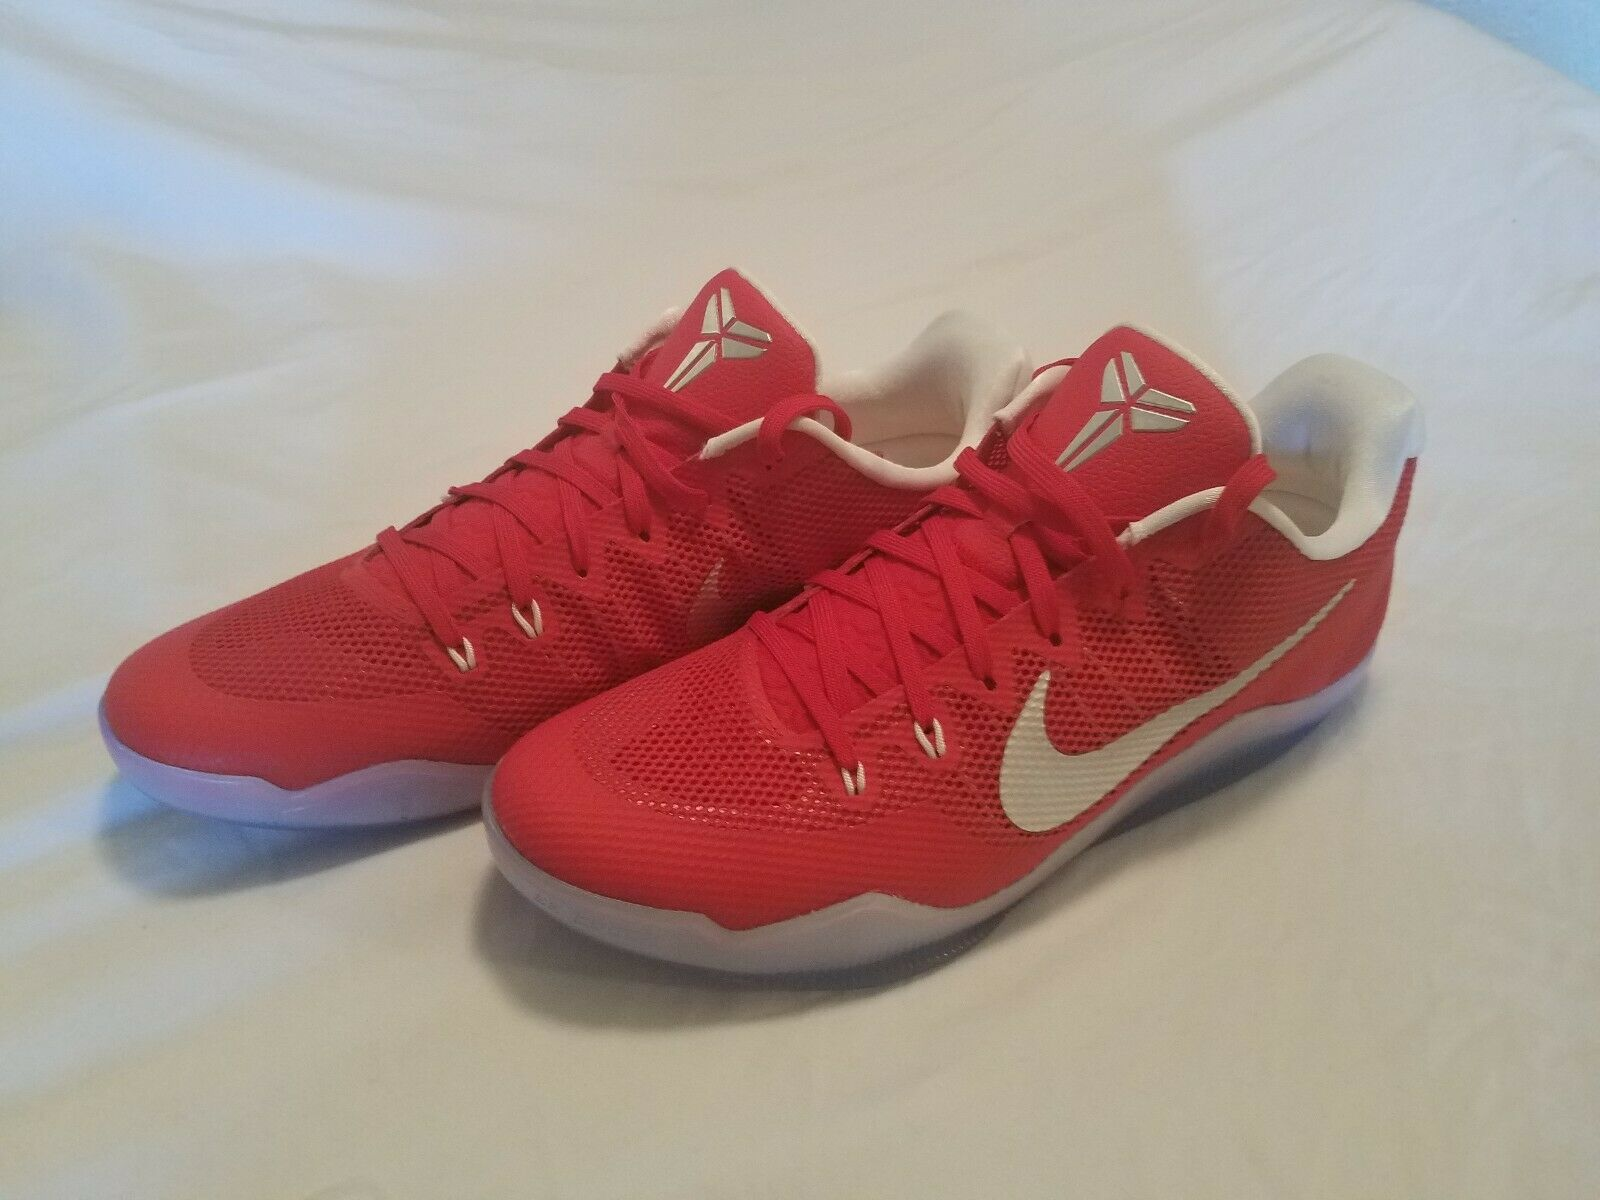 Nike Kobe 11 XI TB Team Bank Promo Size 15 Red White Bryant 856485-663 NEW